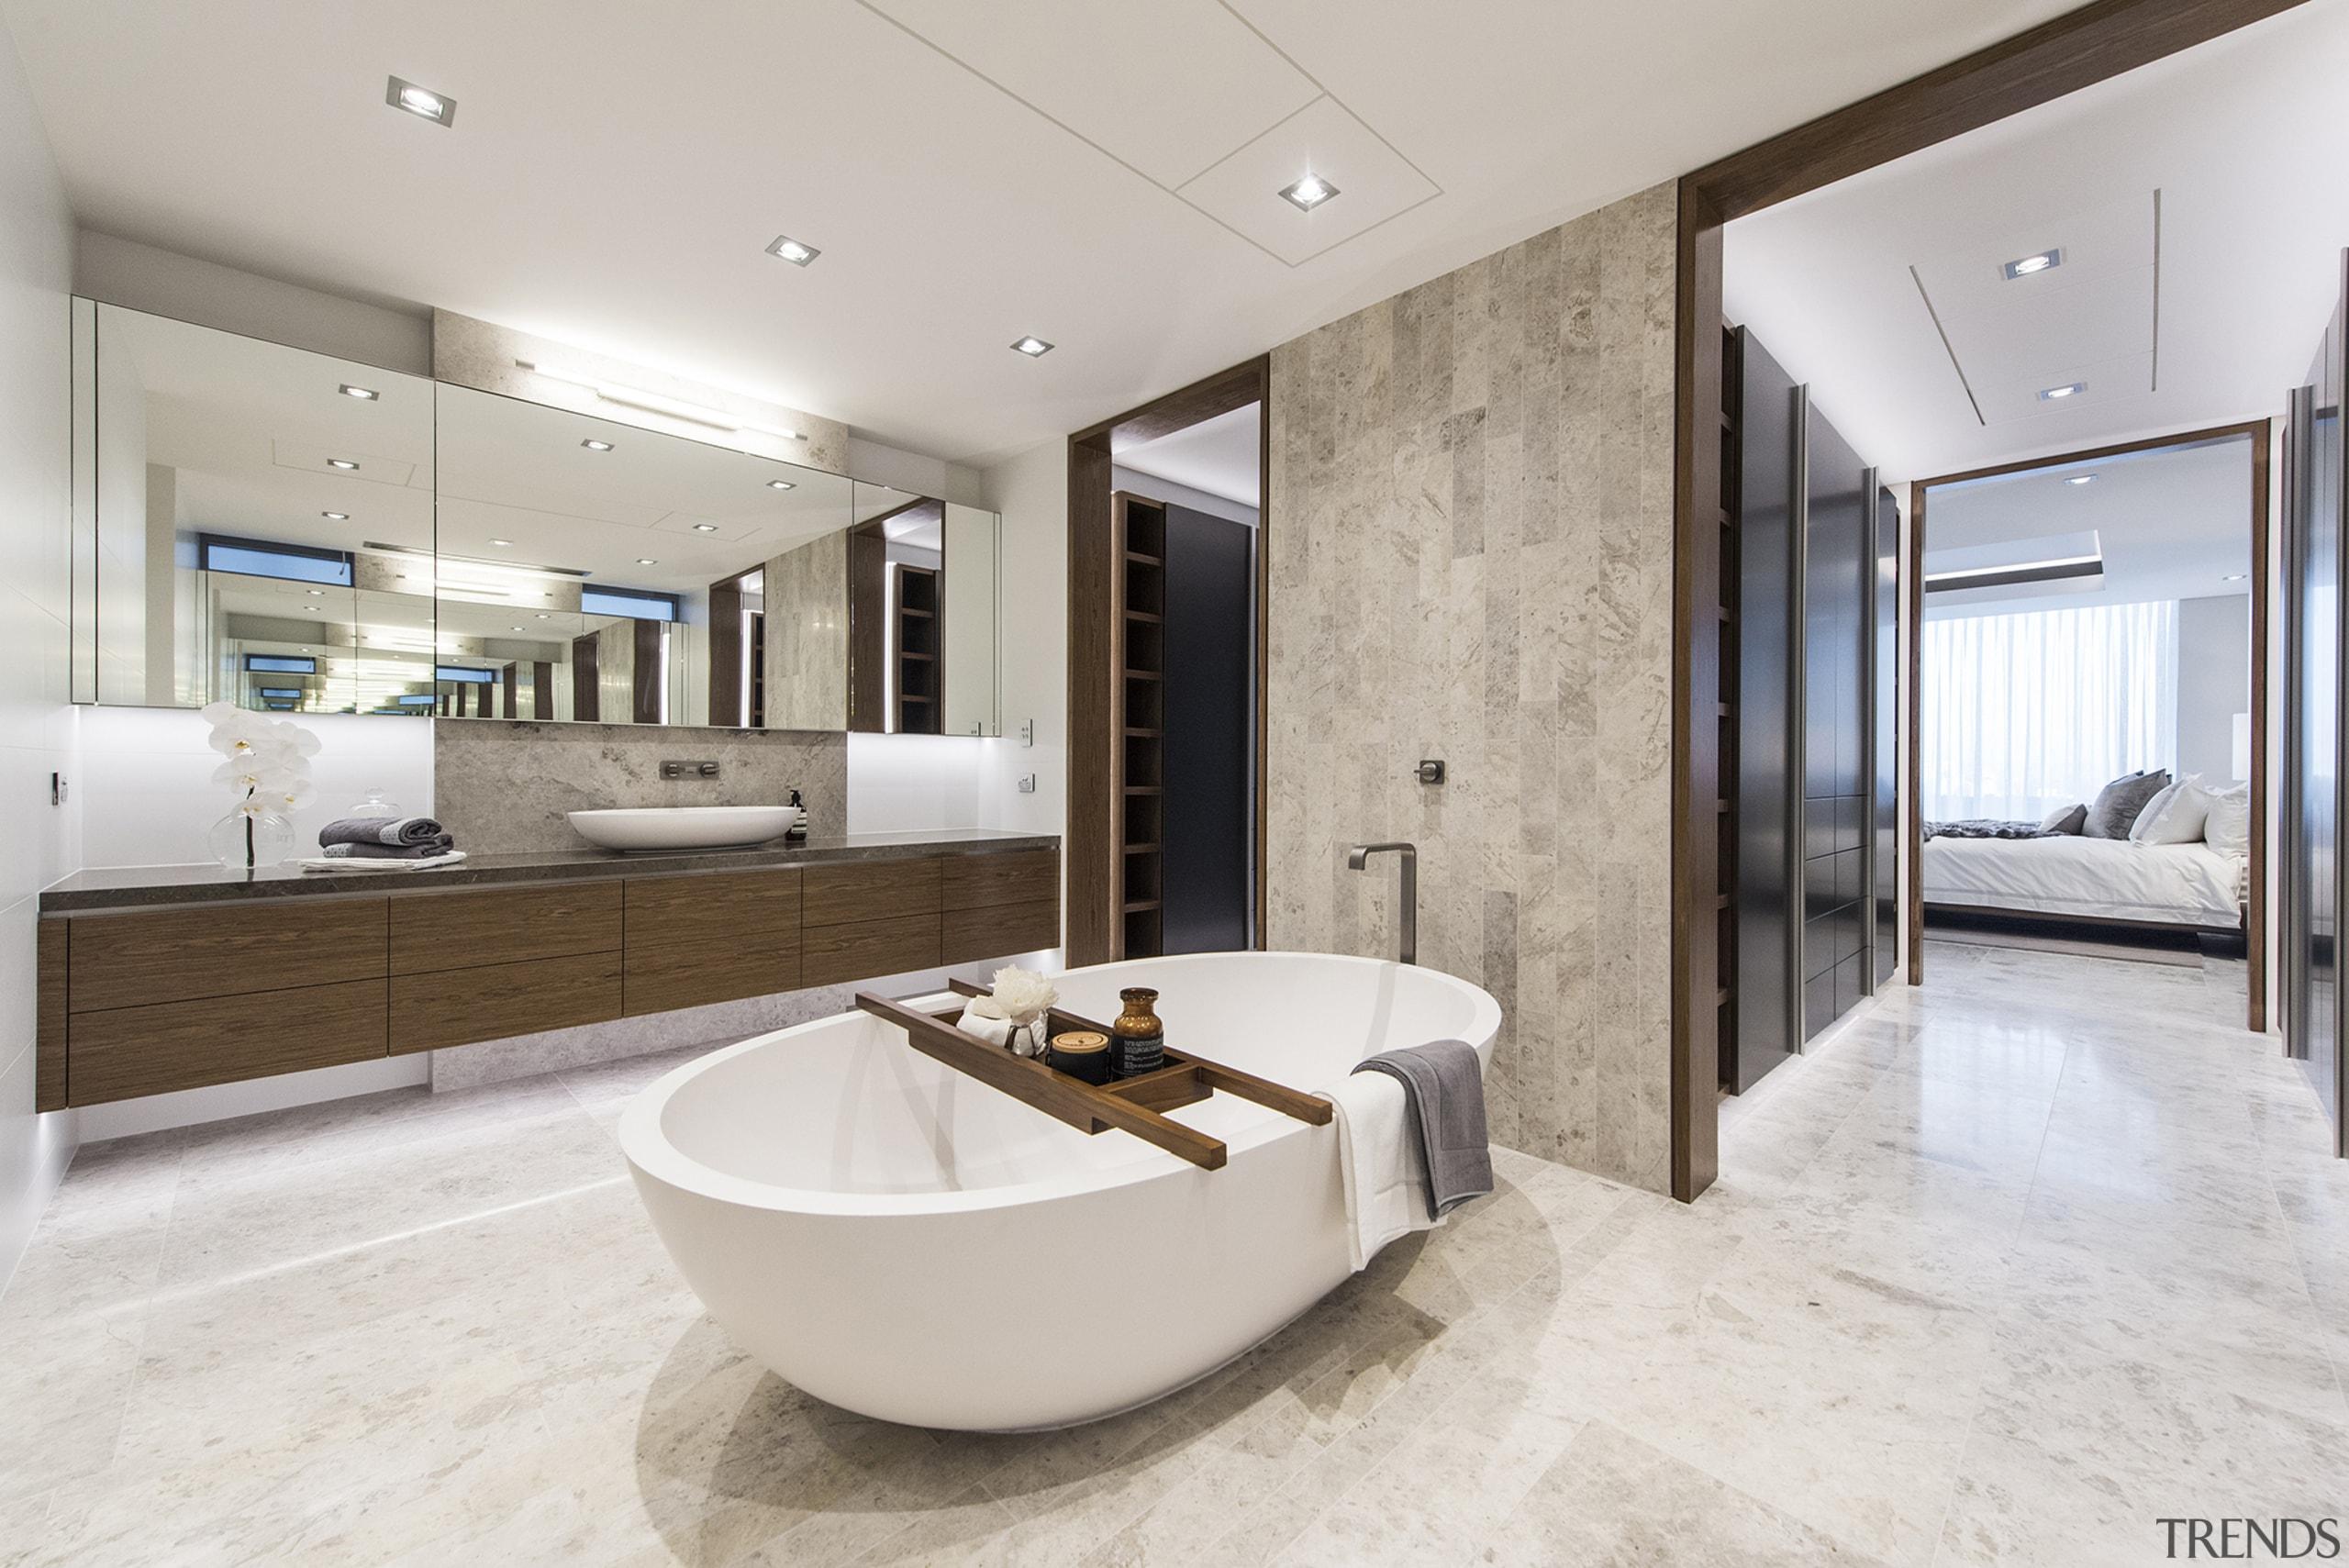 One master bedroom, one master bathroom – and floor, flooring, interior design, real estate, gray